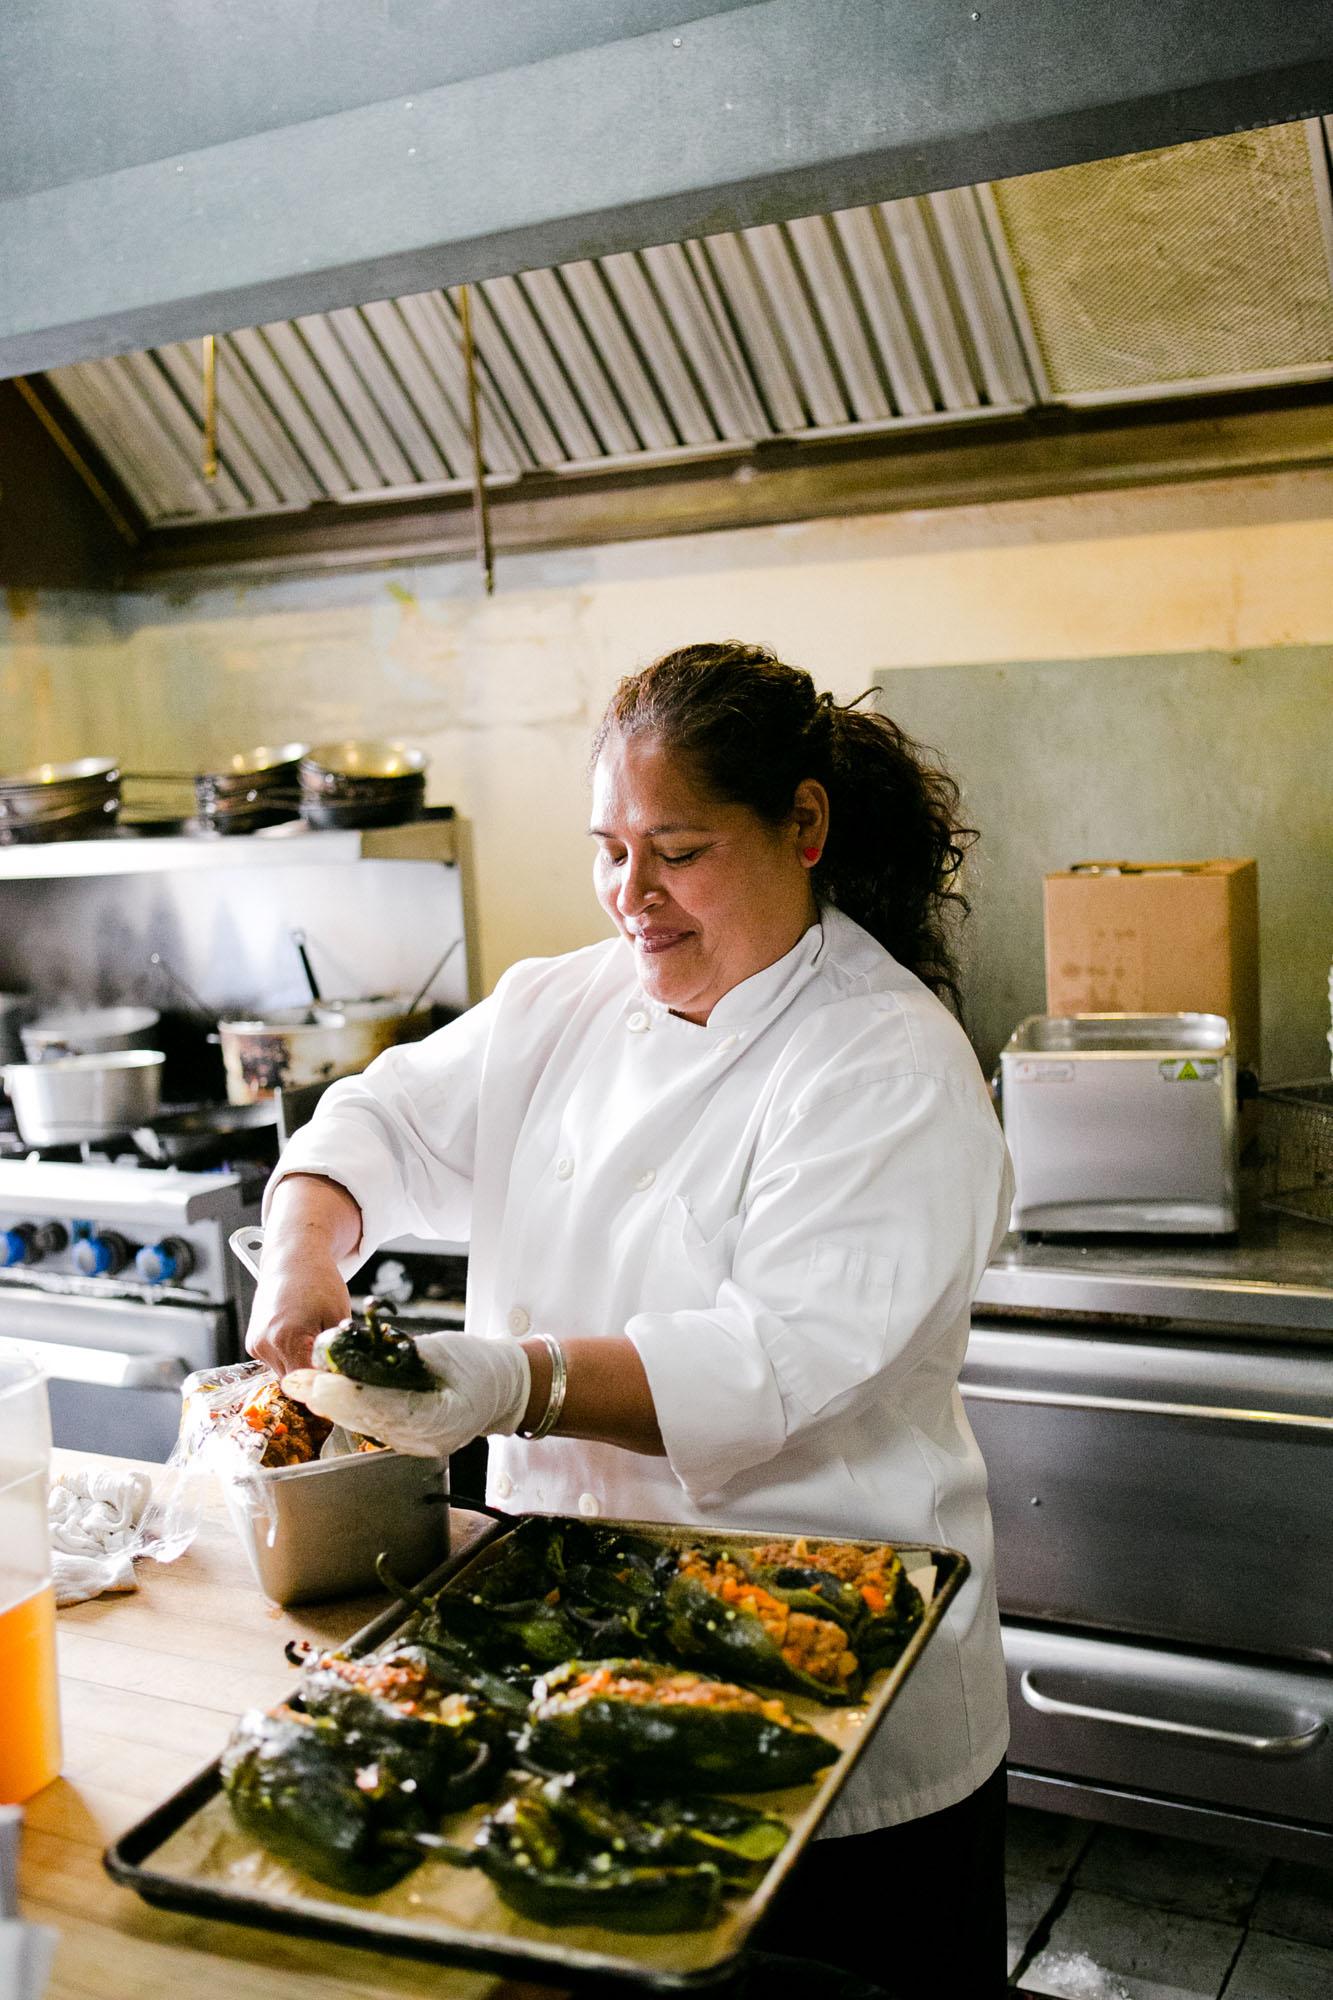 GabriellaCafe-chef-branding-photography.jpg